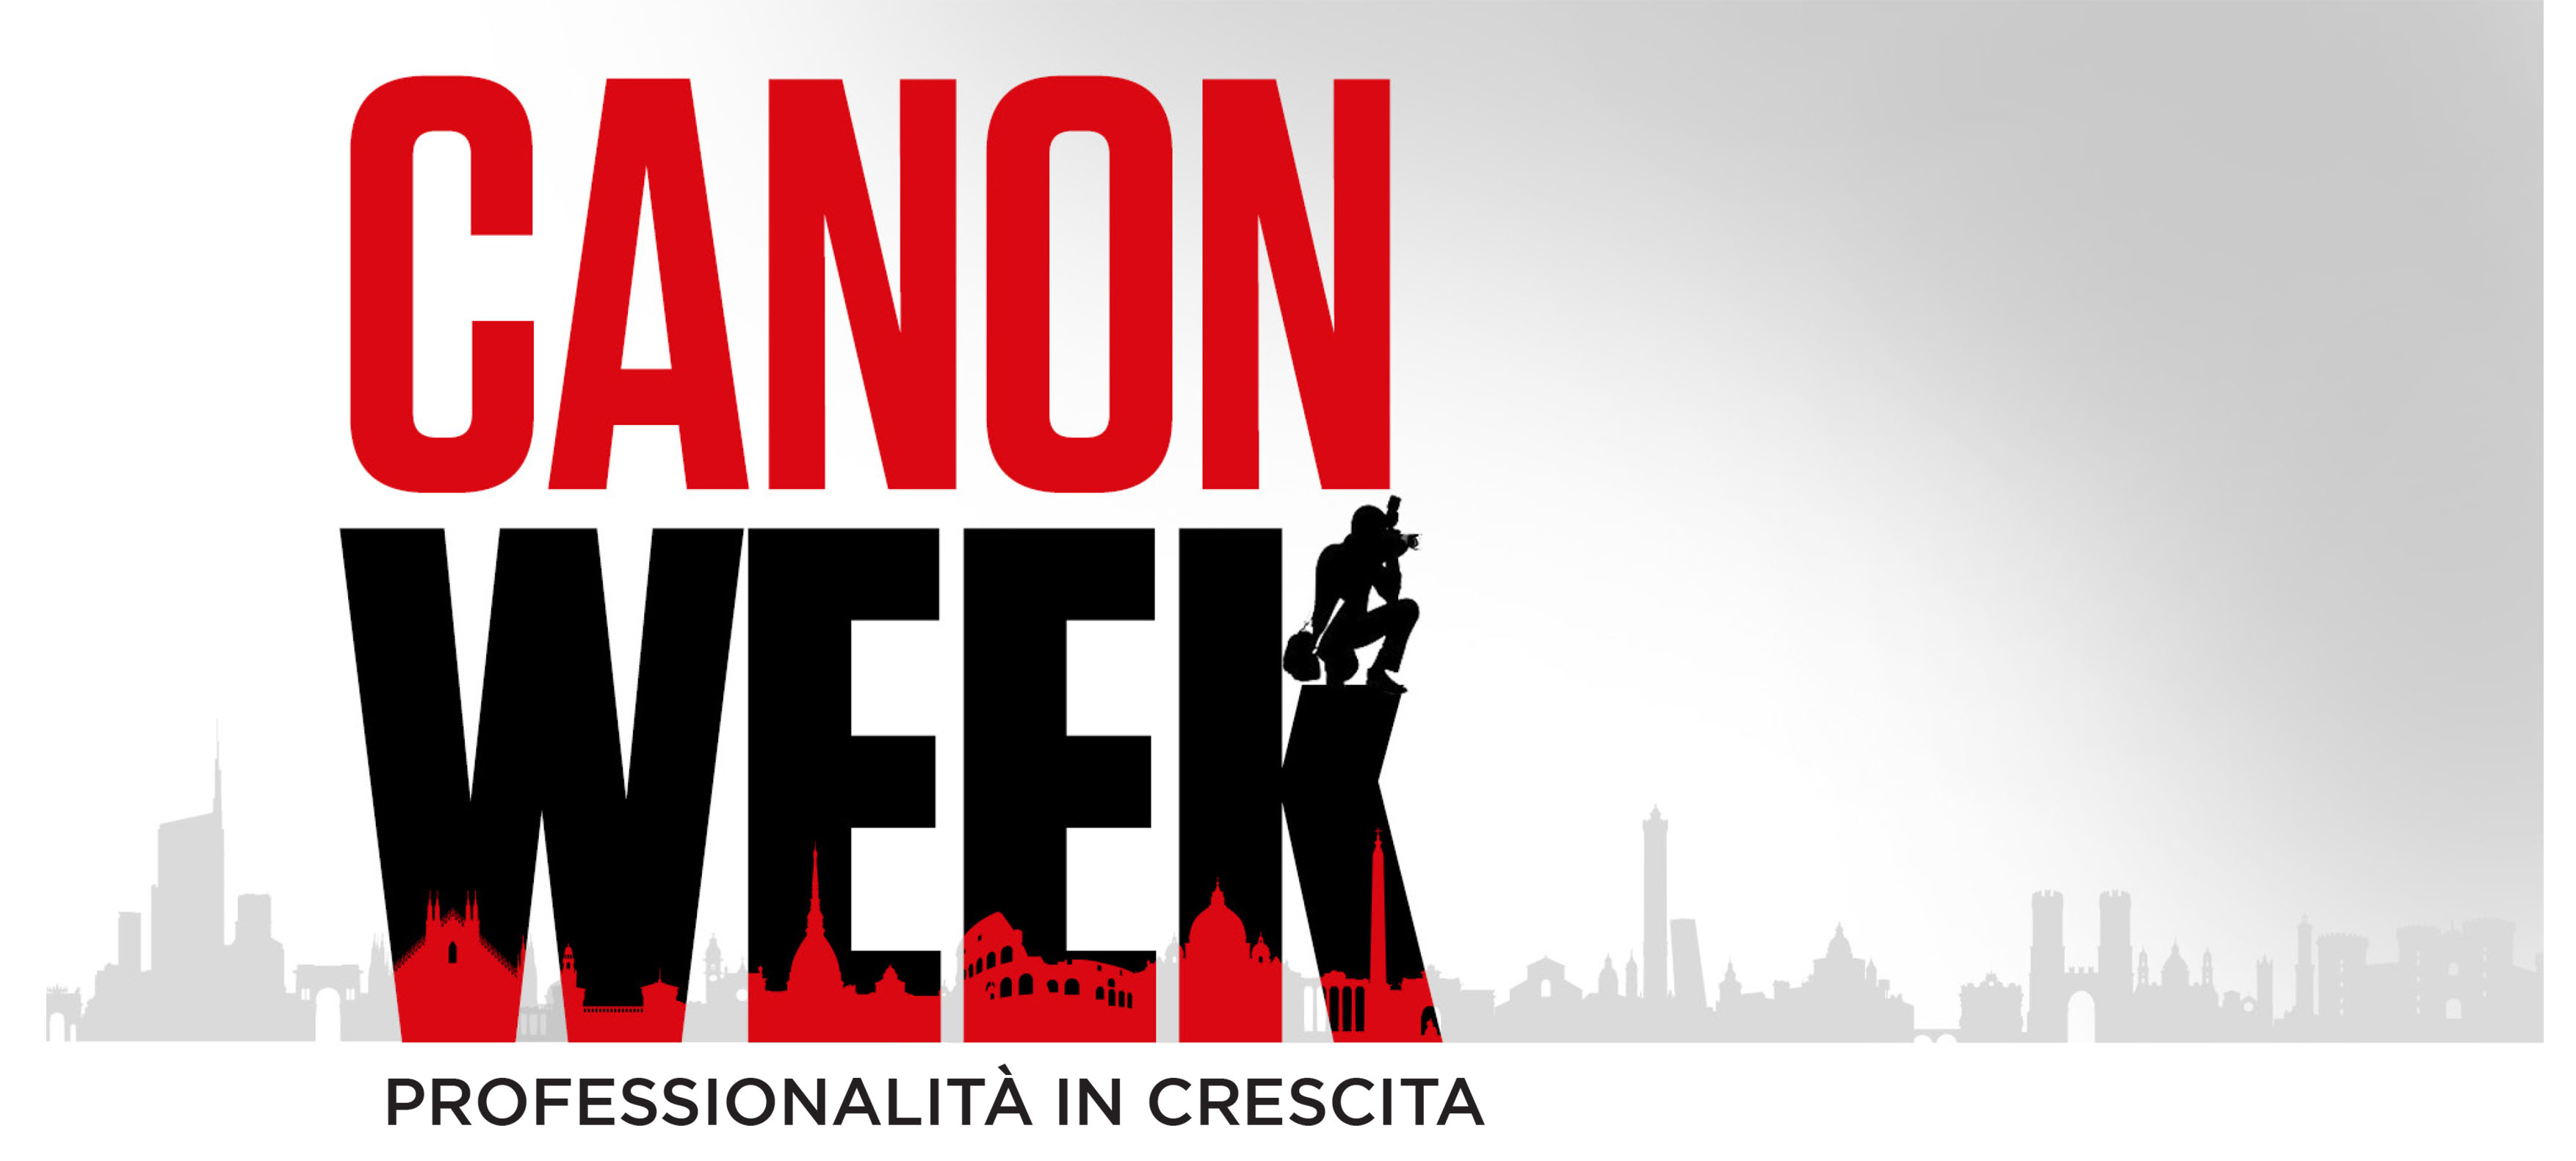 Canon Week Logo